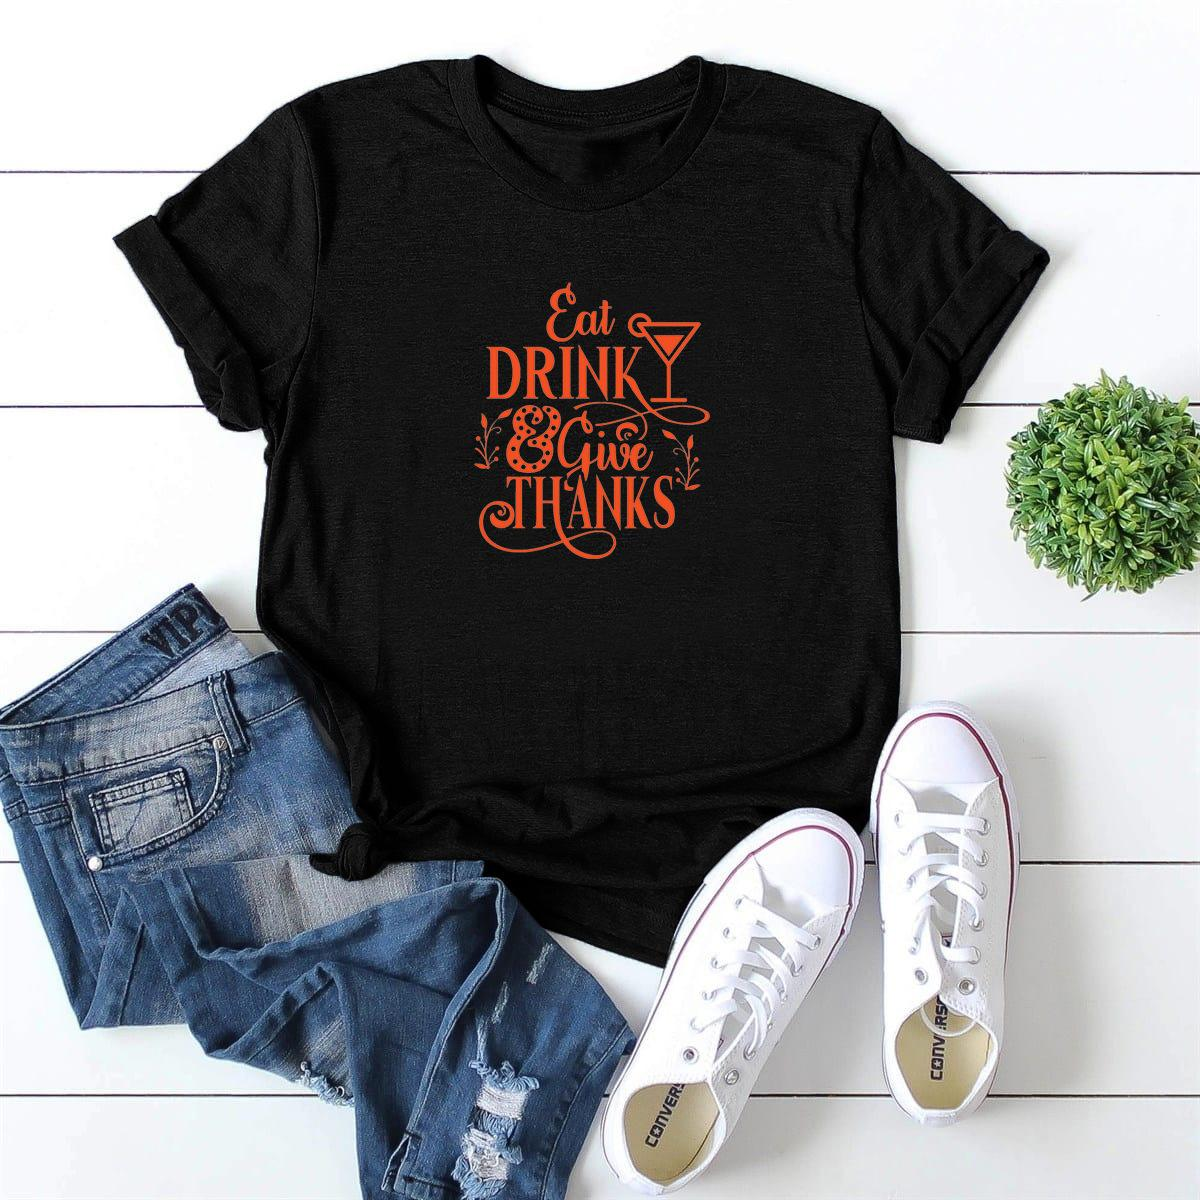 LH20128 Neu bei Getränkegiue Dank Weinglas Muster Gedruckt Rundhals Kurzarm T-Shirt Frauen